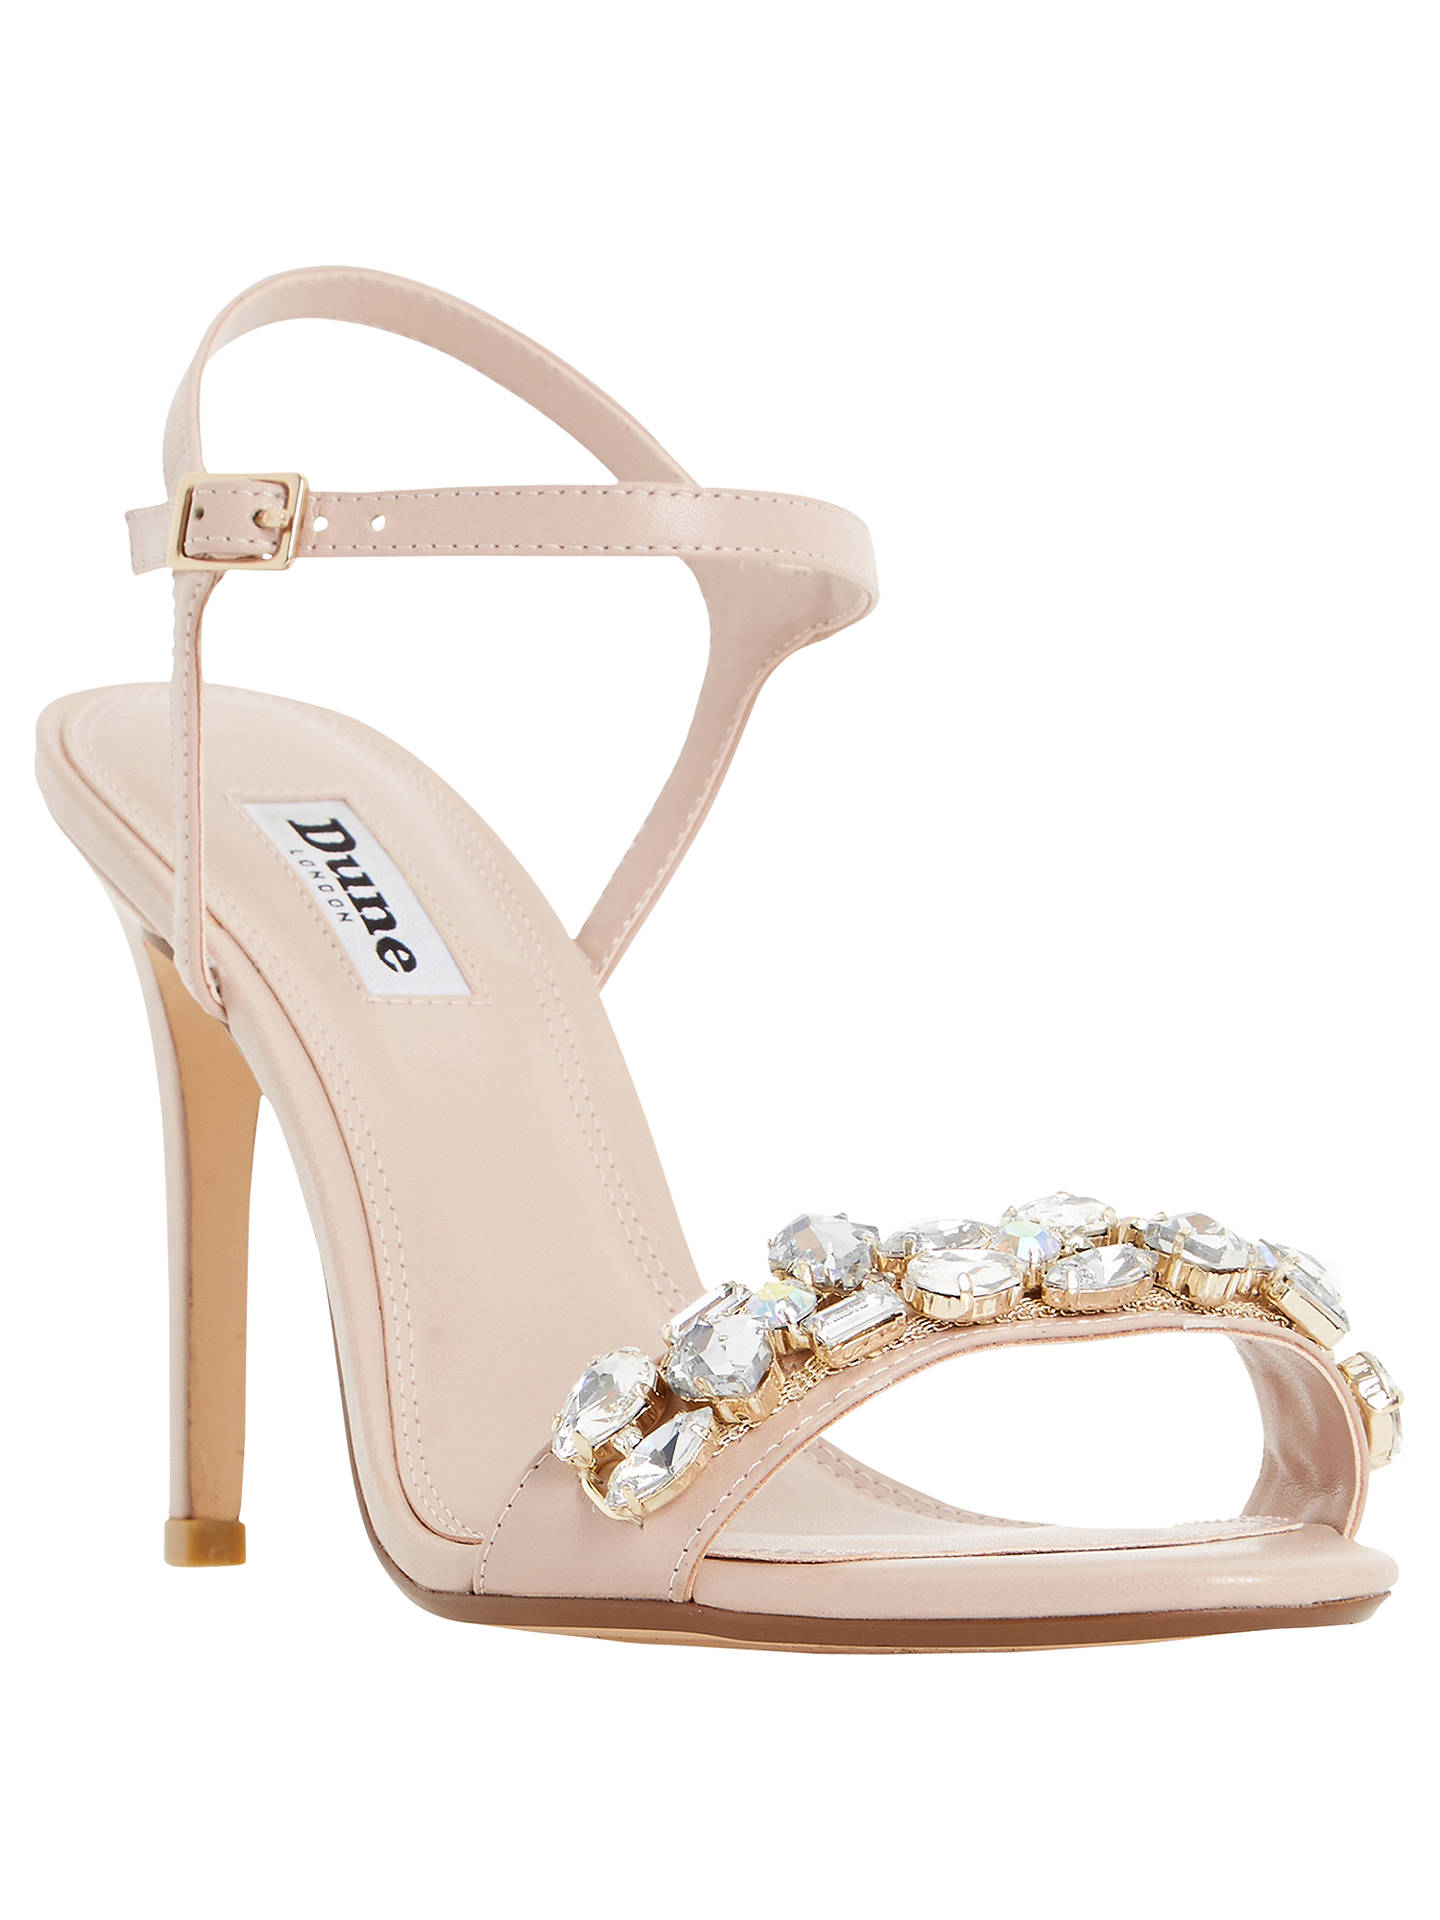 df1f8125e Dune Mya Jewel Embellished High Heel Sandals at John Lewis   Partners